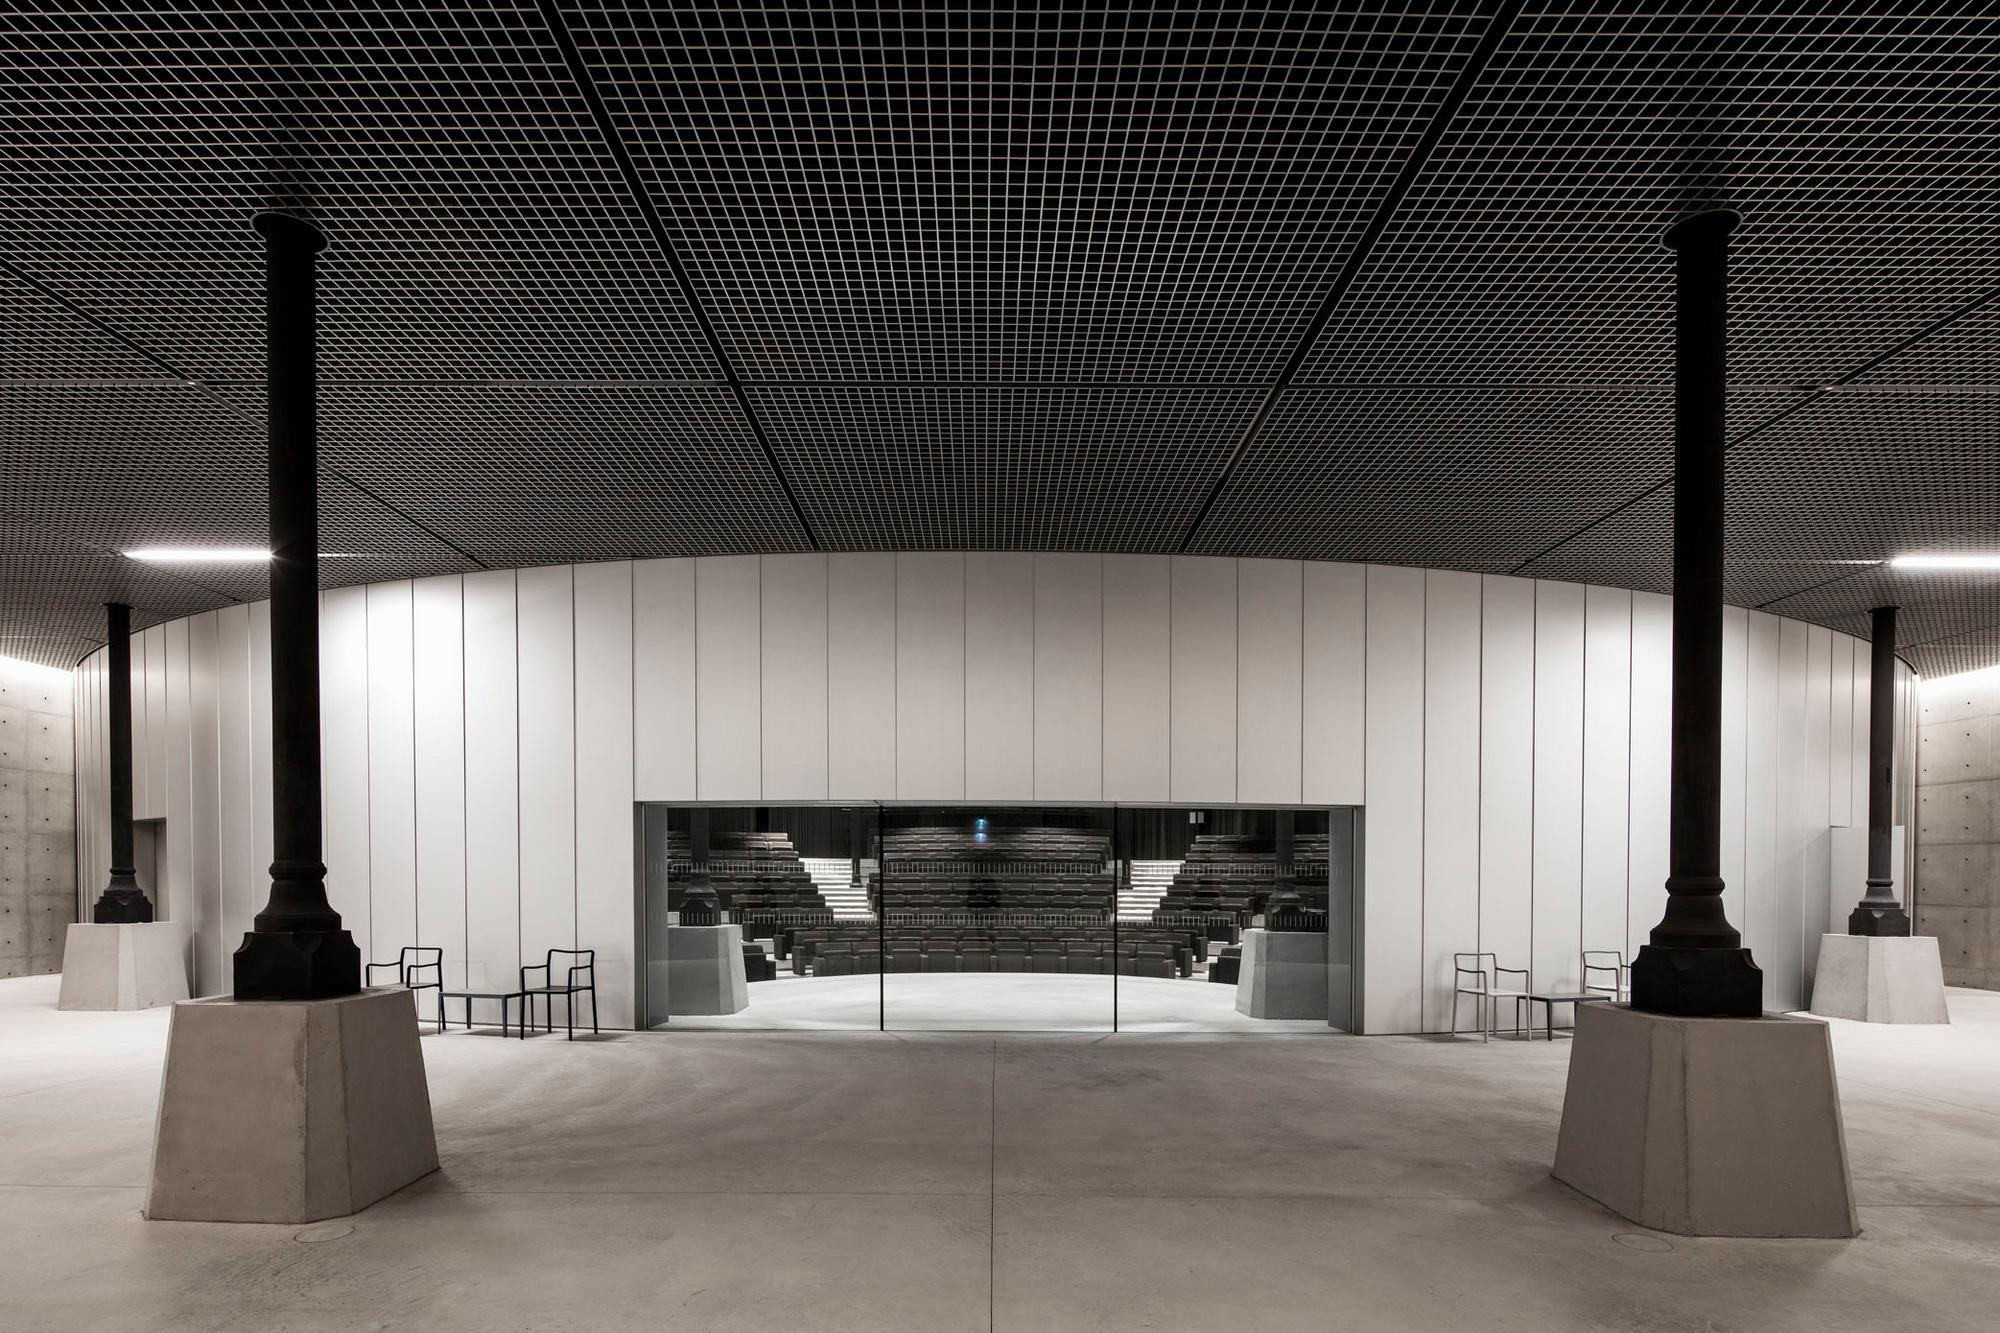 Bourse de Commerce - Pinault Collection ┬® Tadao Ando Architect & Associates, Niney et Marca Architectes., Patrick Tourneboeuf